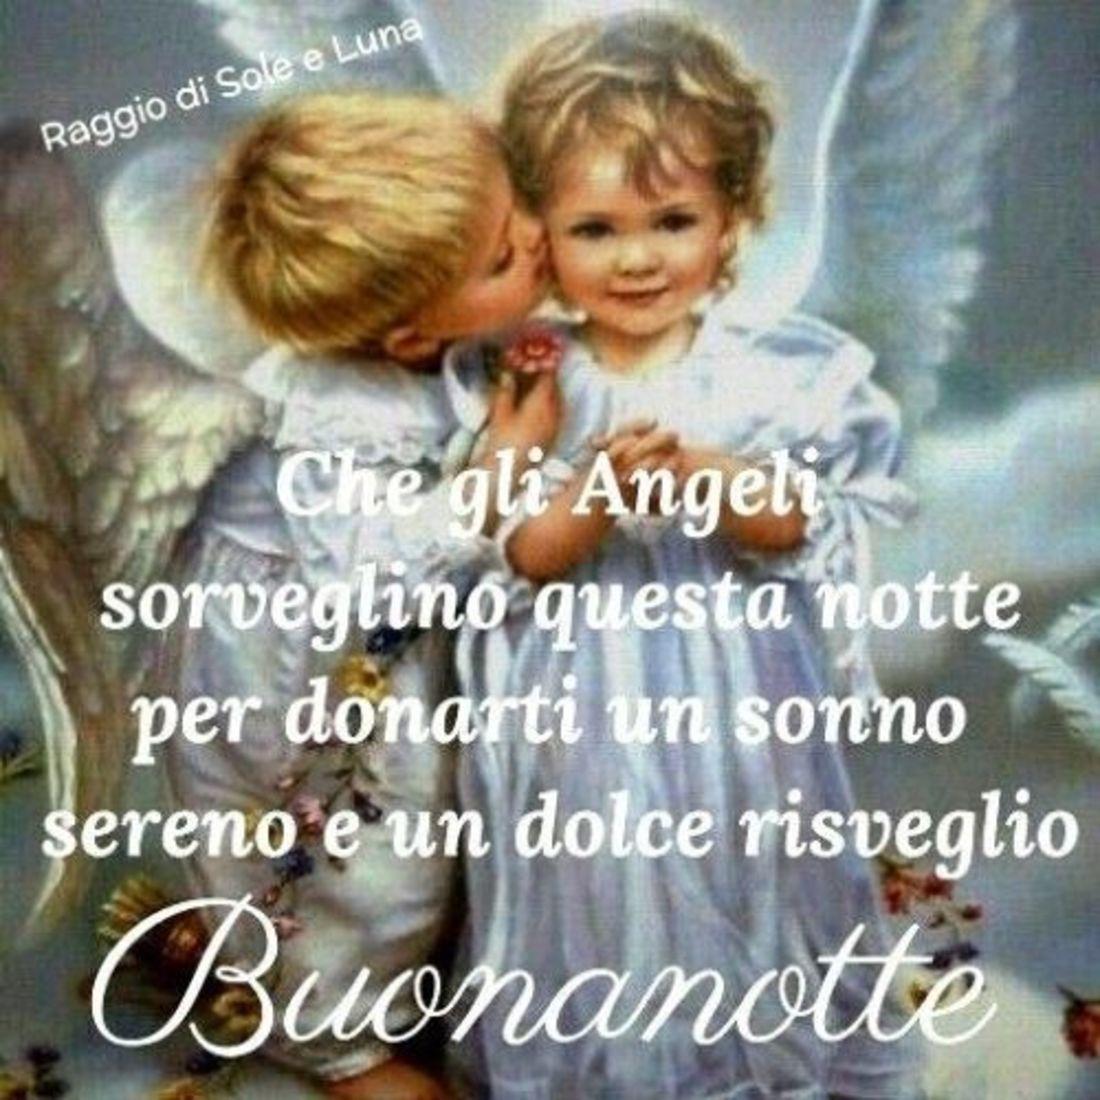 Buonanotte Angeli 9